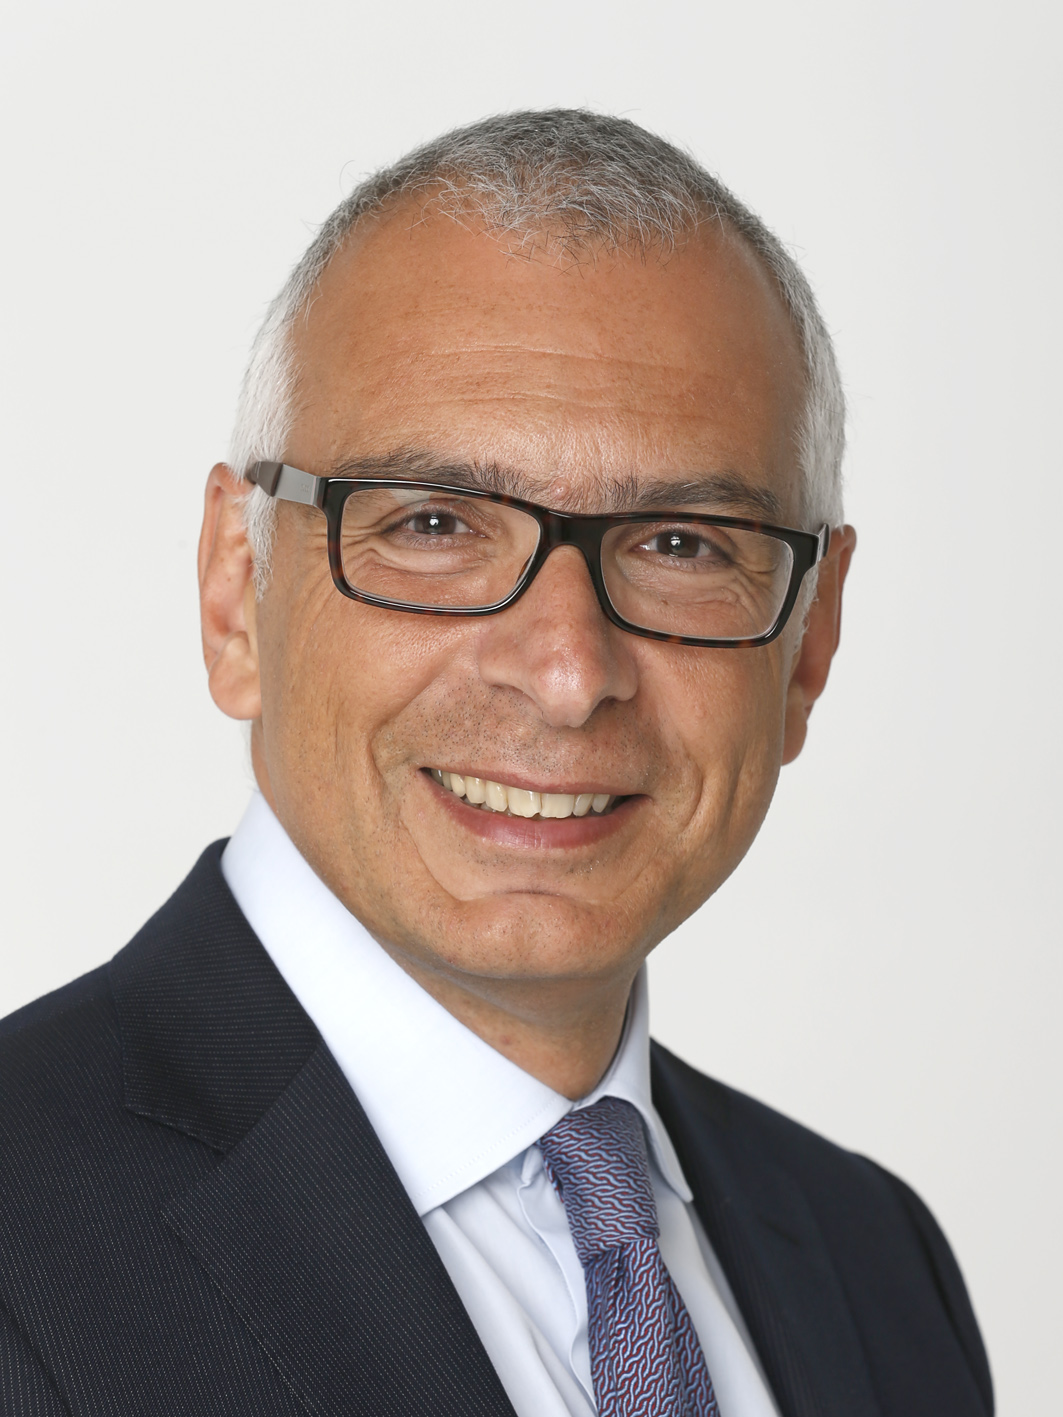 Ambassador Stefano Sannino